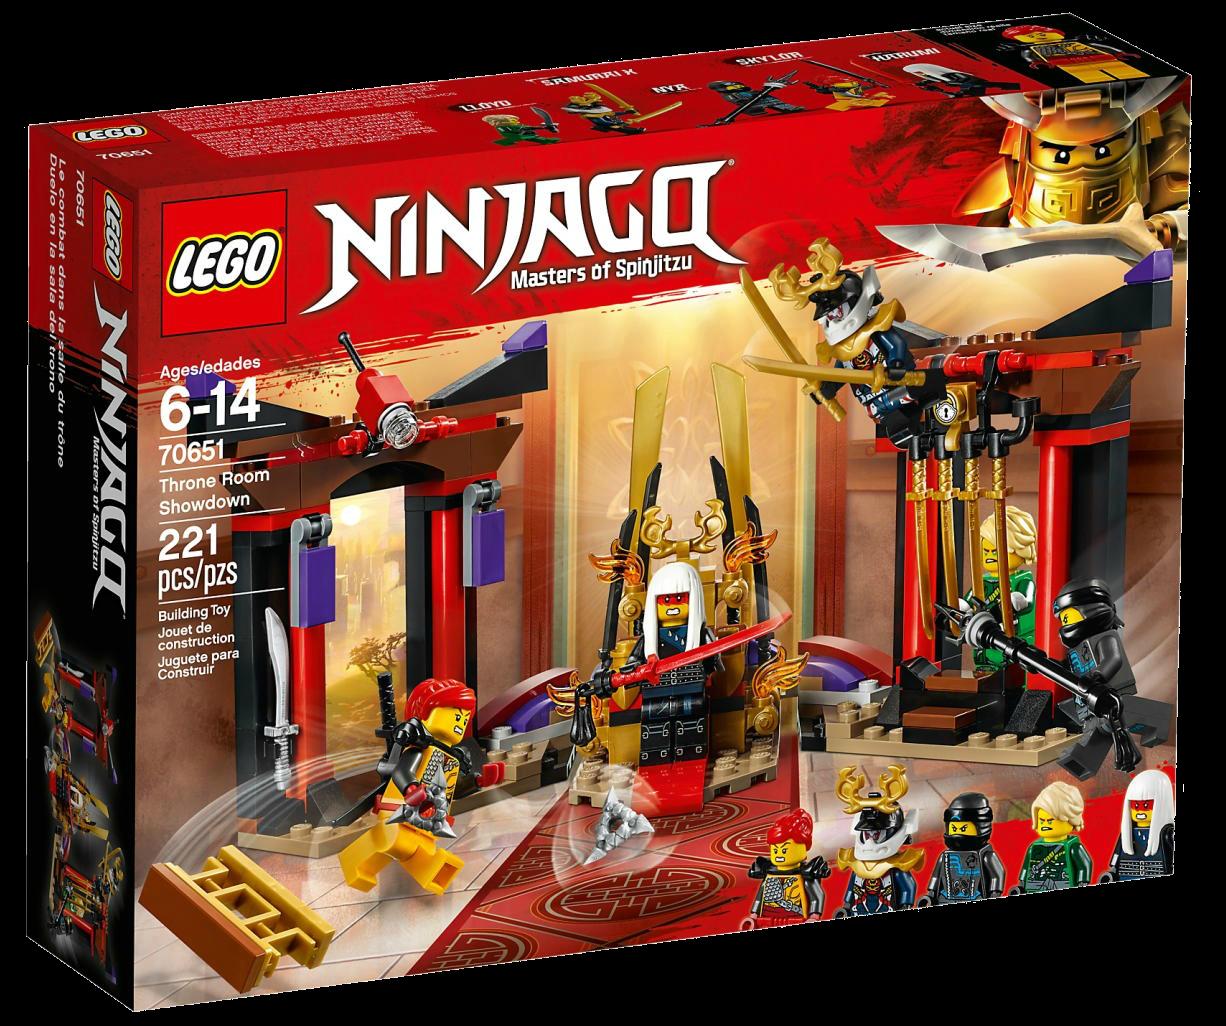 70651 Throne Room Showdown Ninjago Wiki Fandom